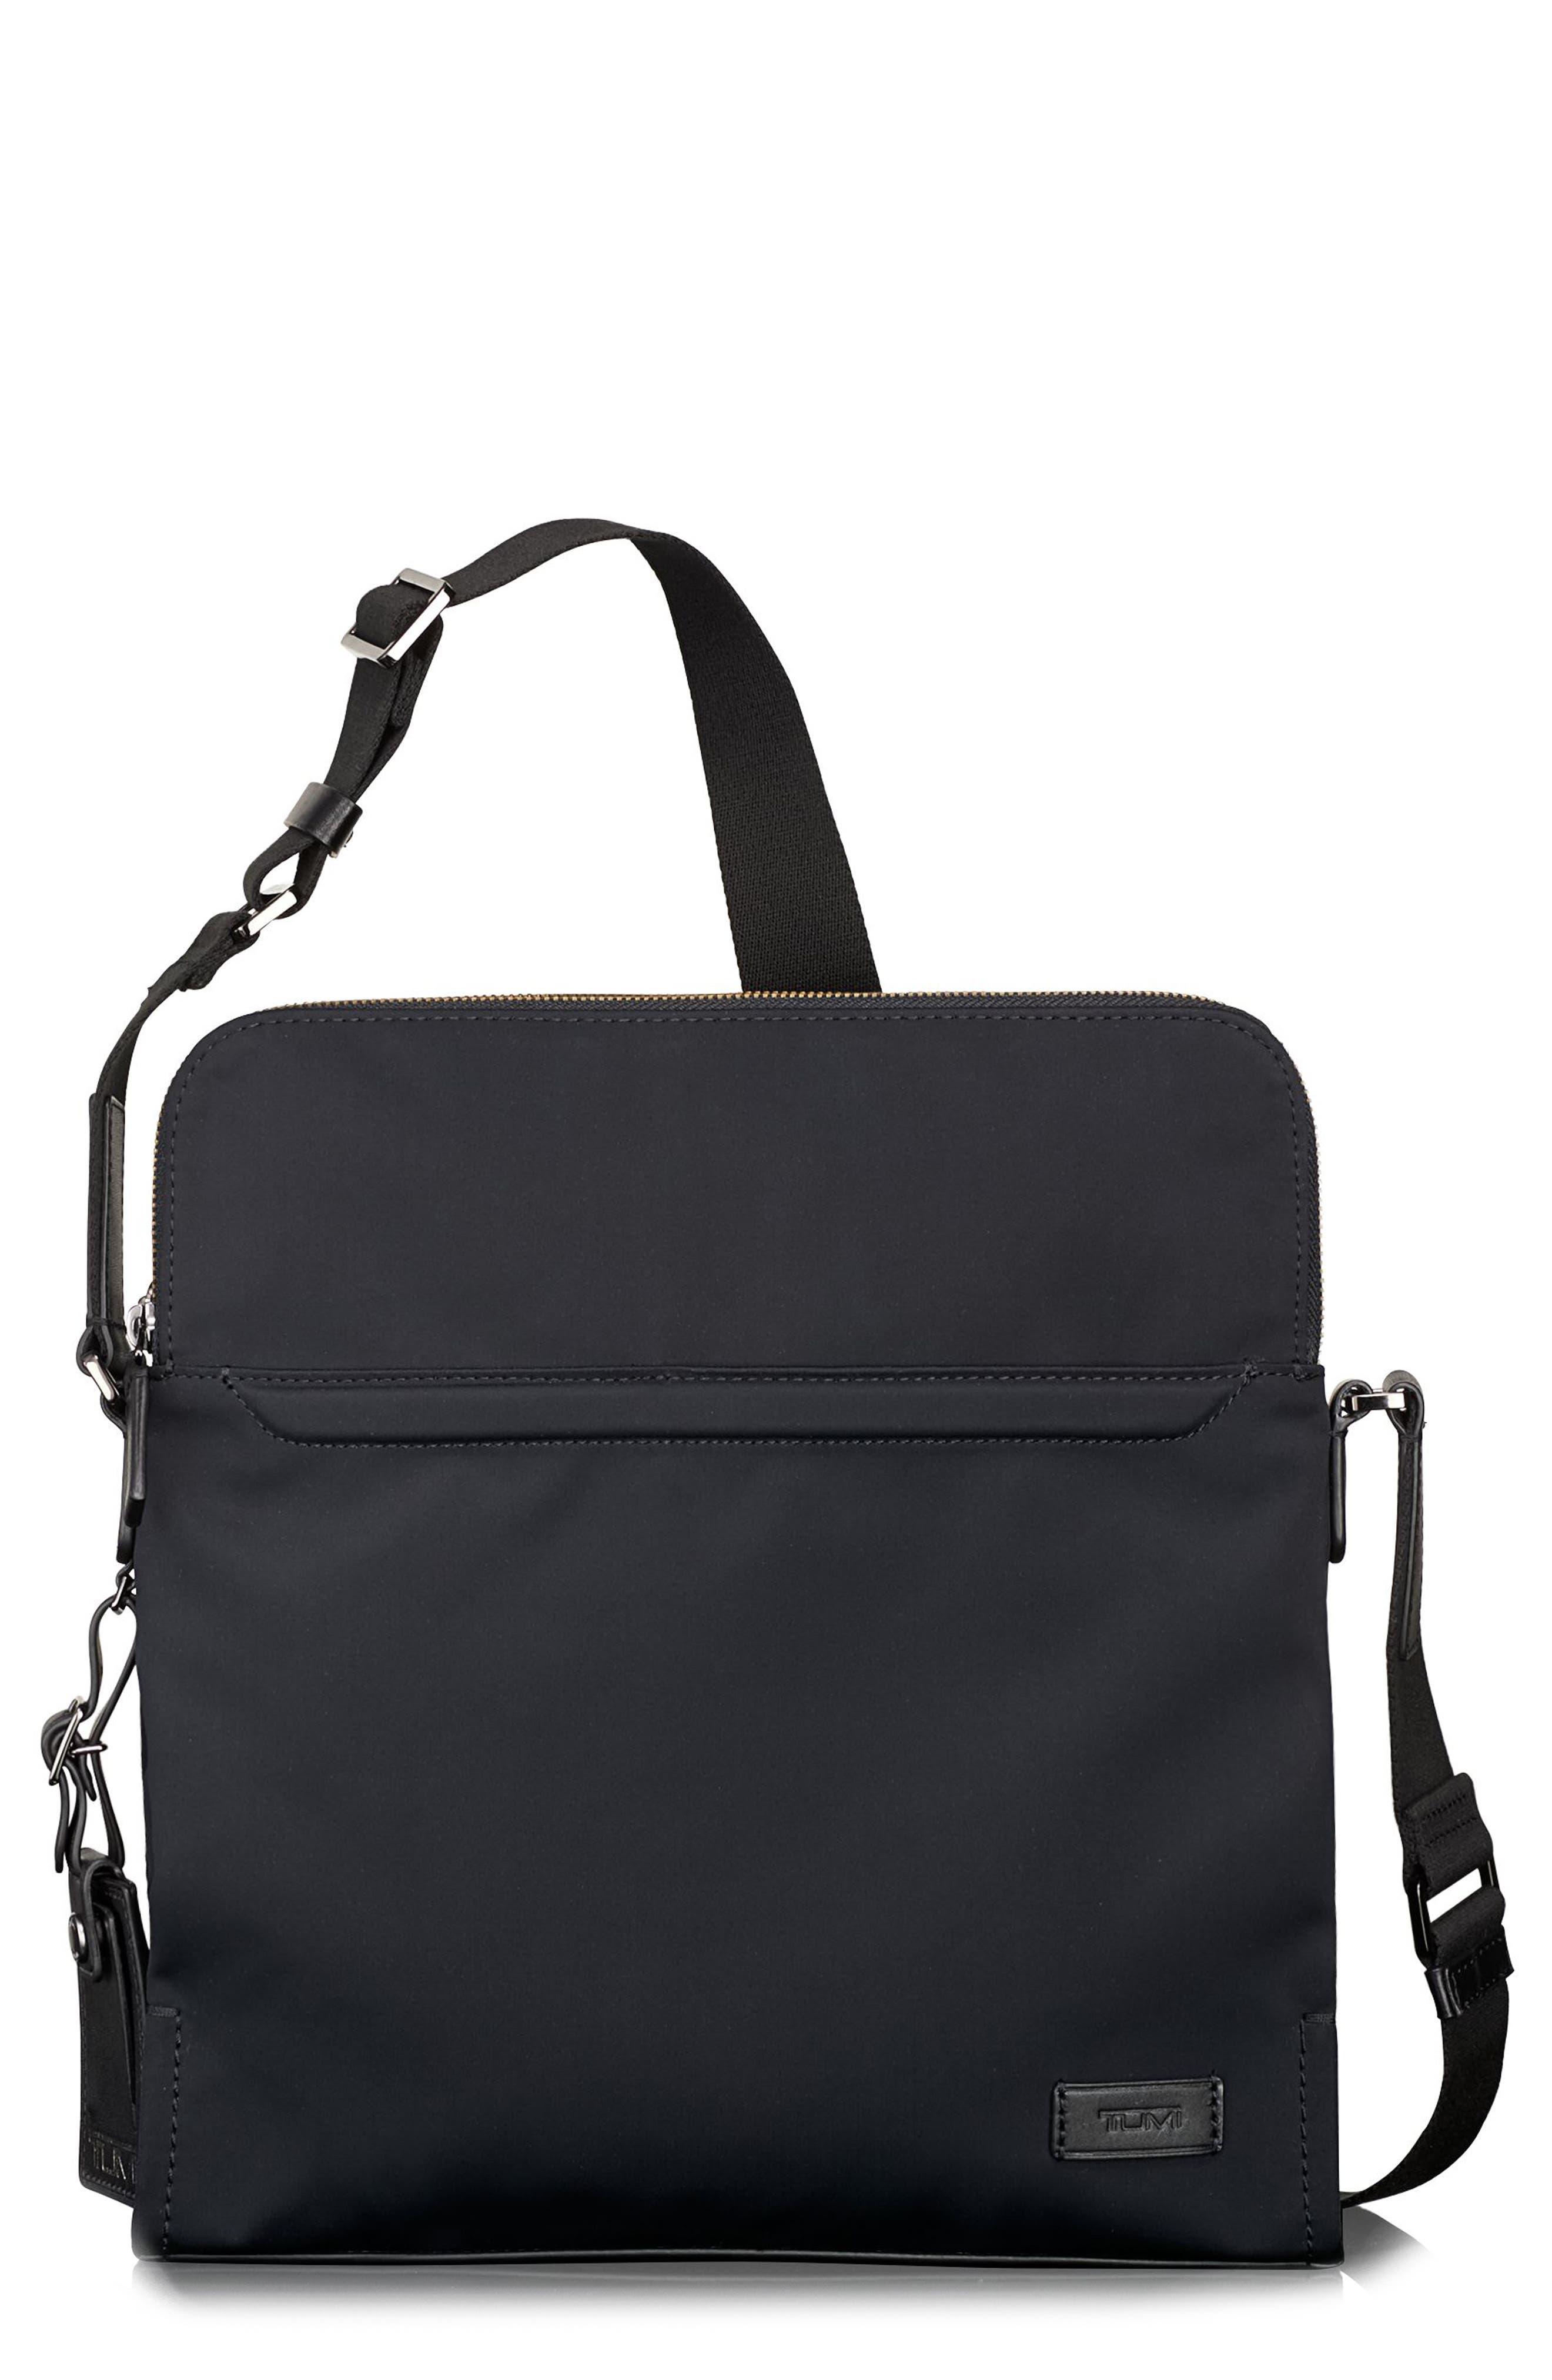 Harrison Stratton Messenger Bag,                         Main,                         color, 001